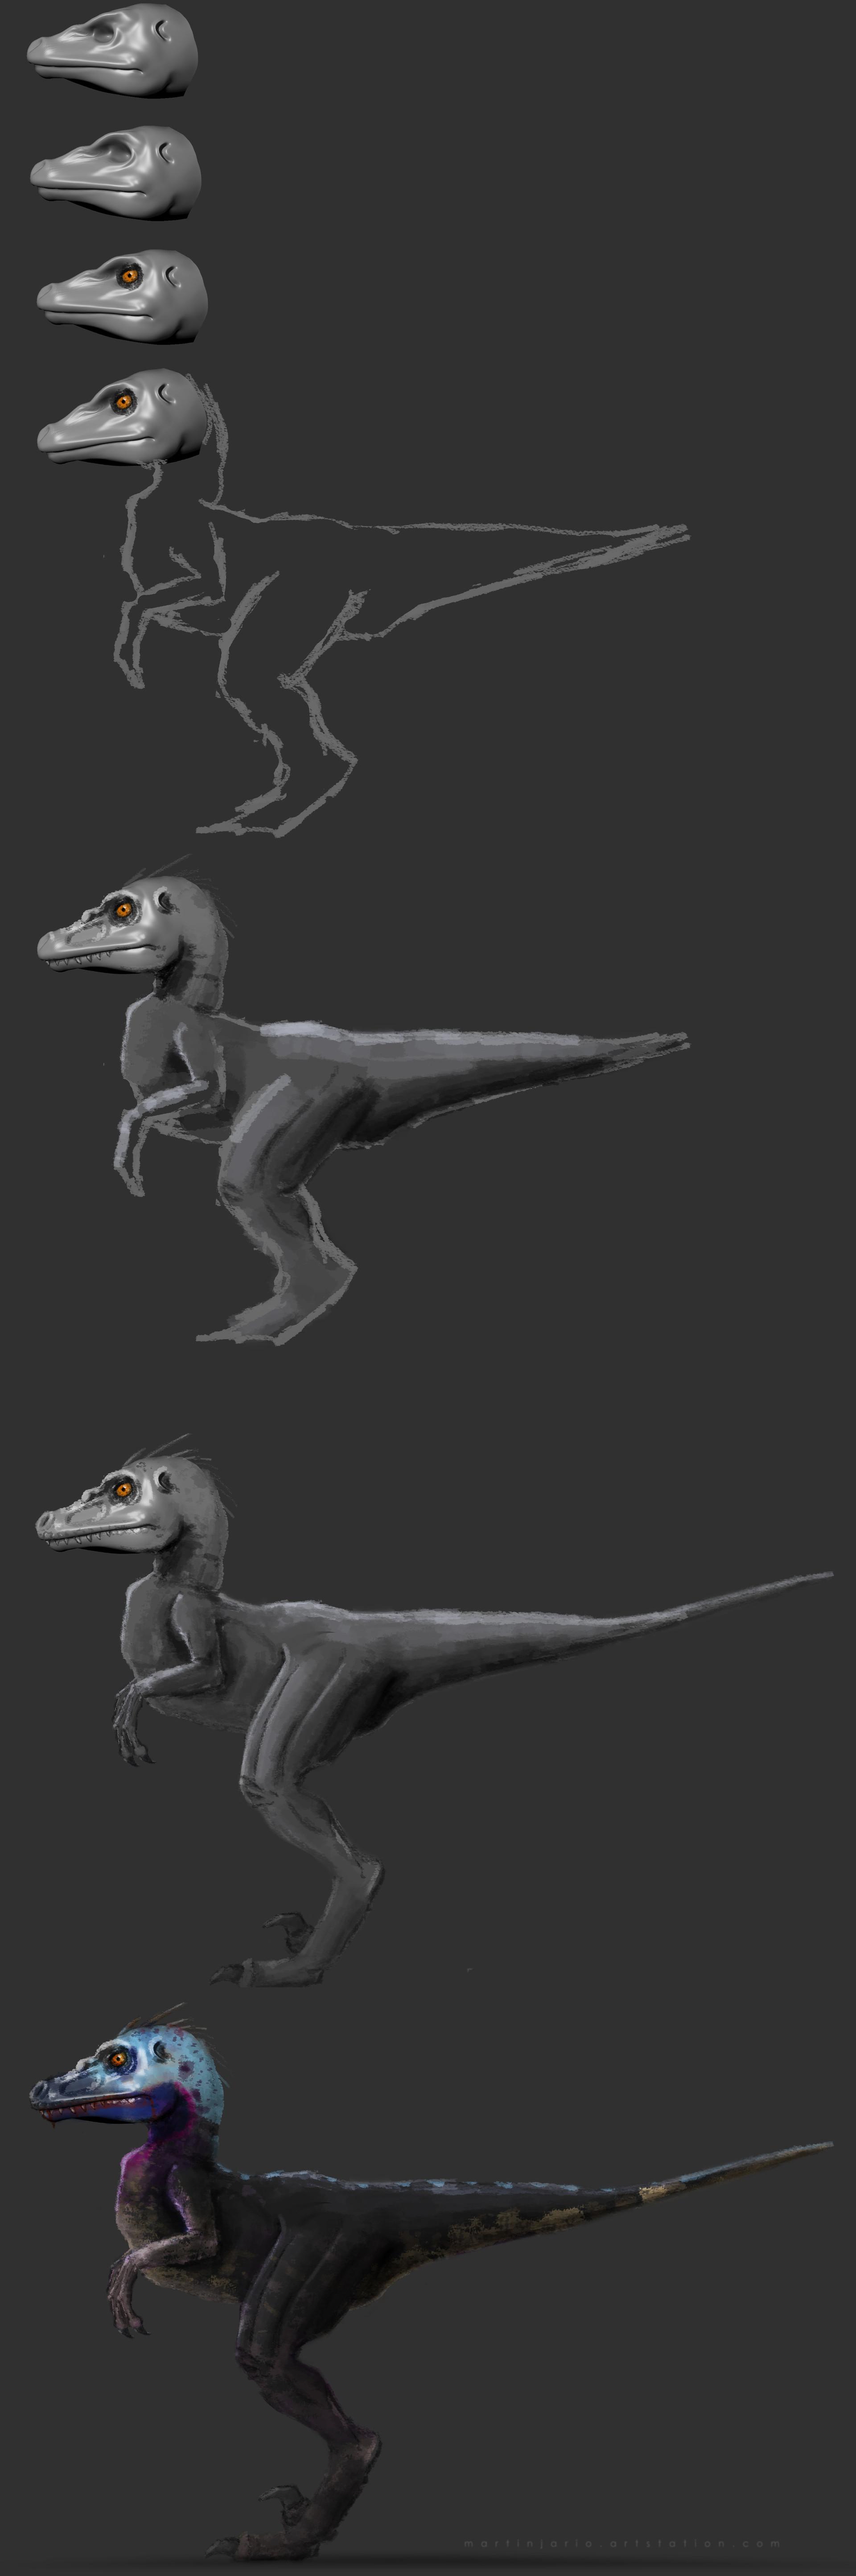 Martin jario martinjario velociraptor process